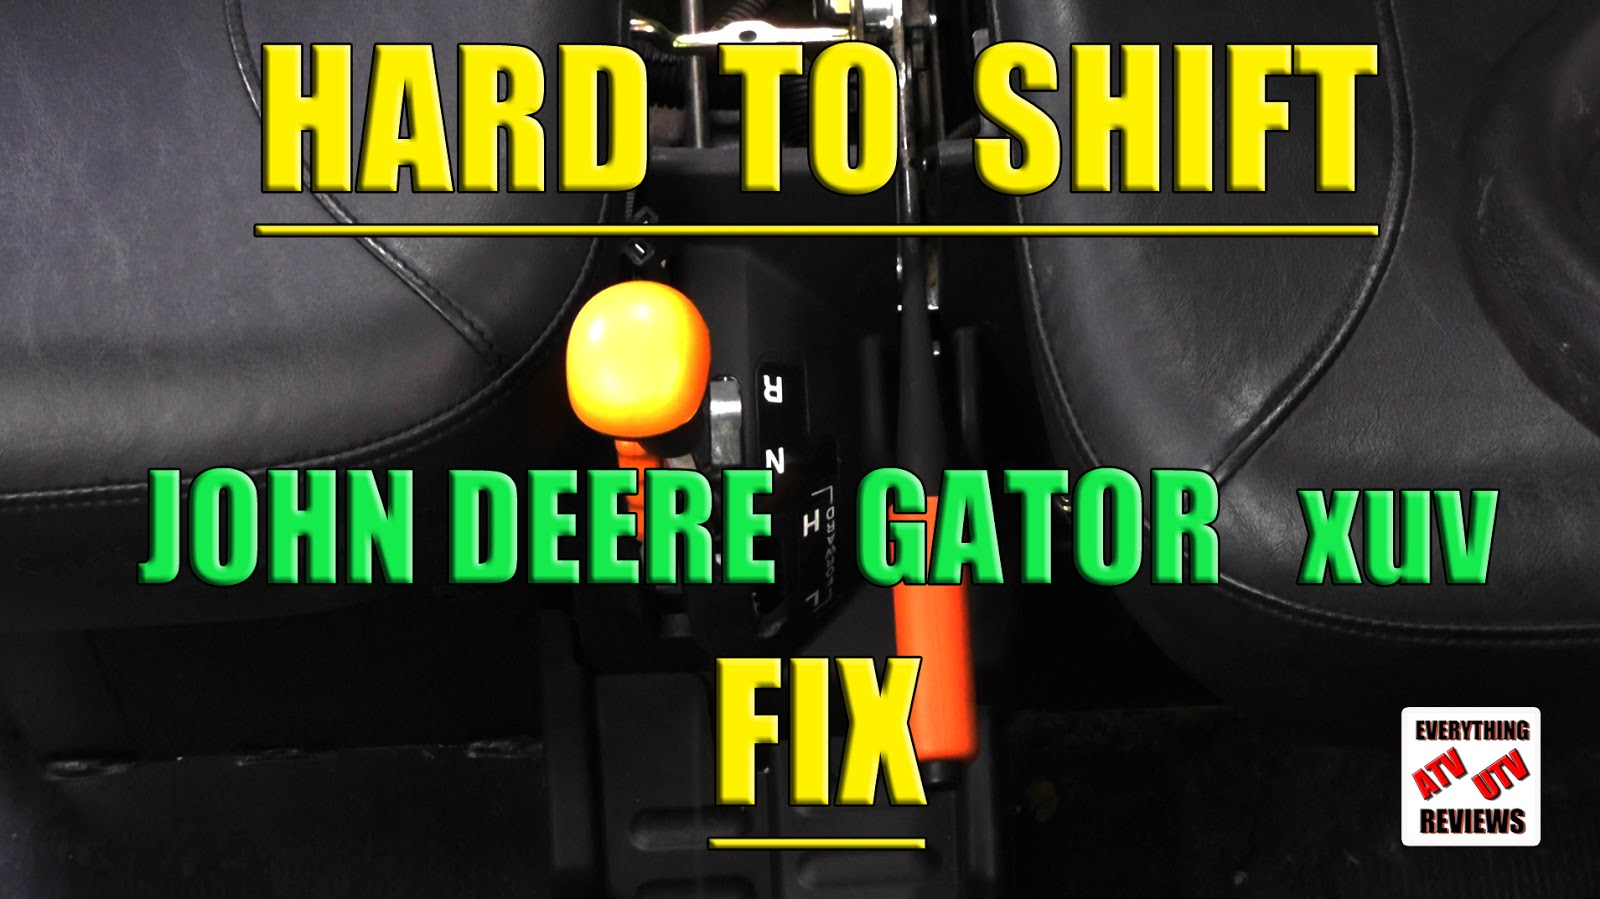 small resolution of 2013 john deere gator 855d wiring diagram everything atv utv reviews john deere gator